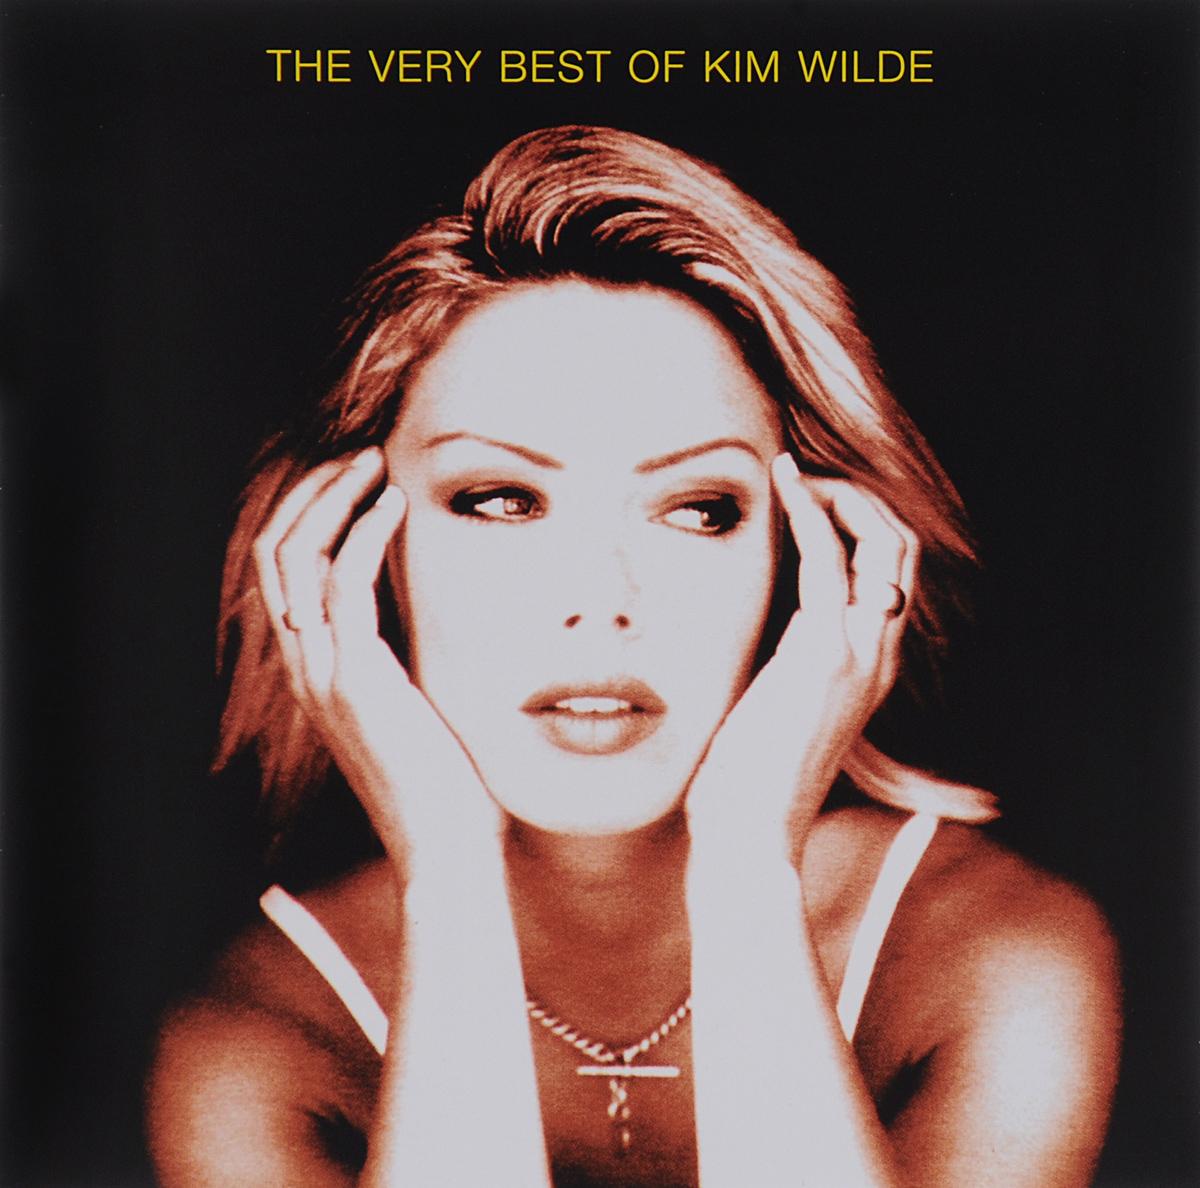 Kim Wilde. The Very Best Of Kim Wilde